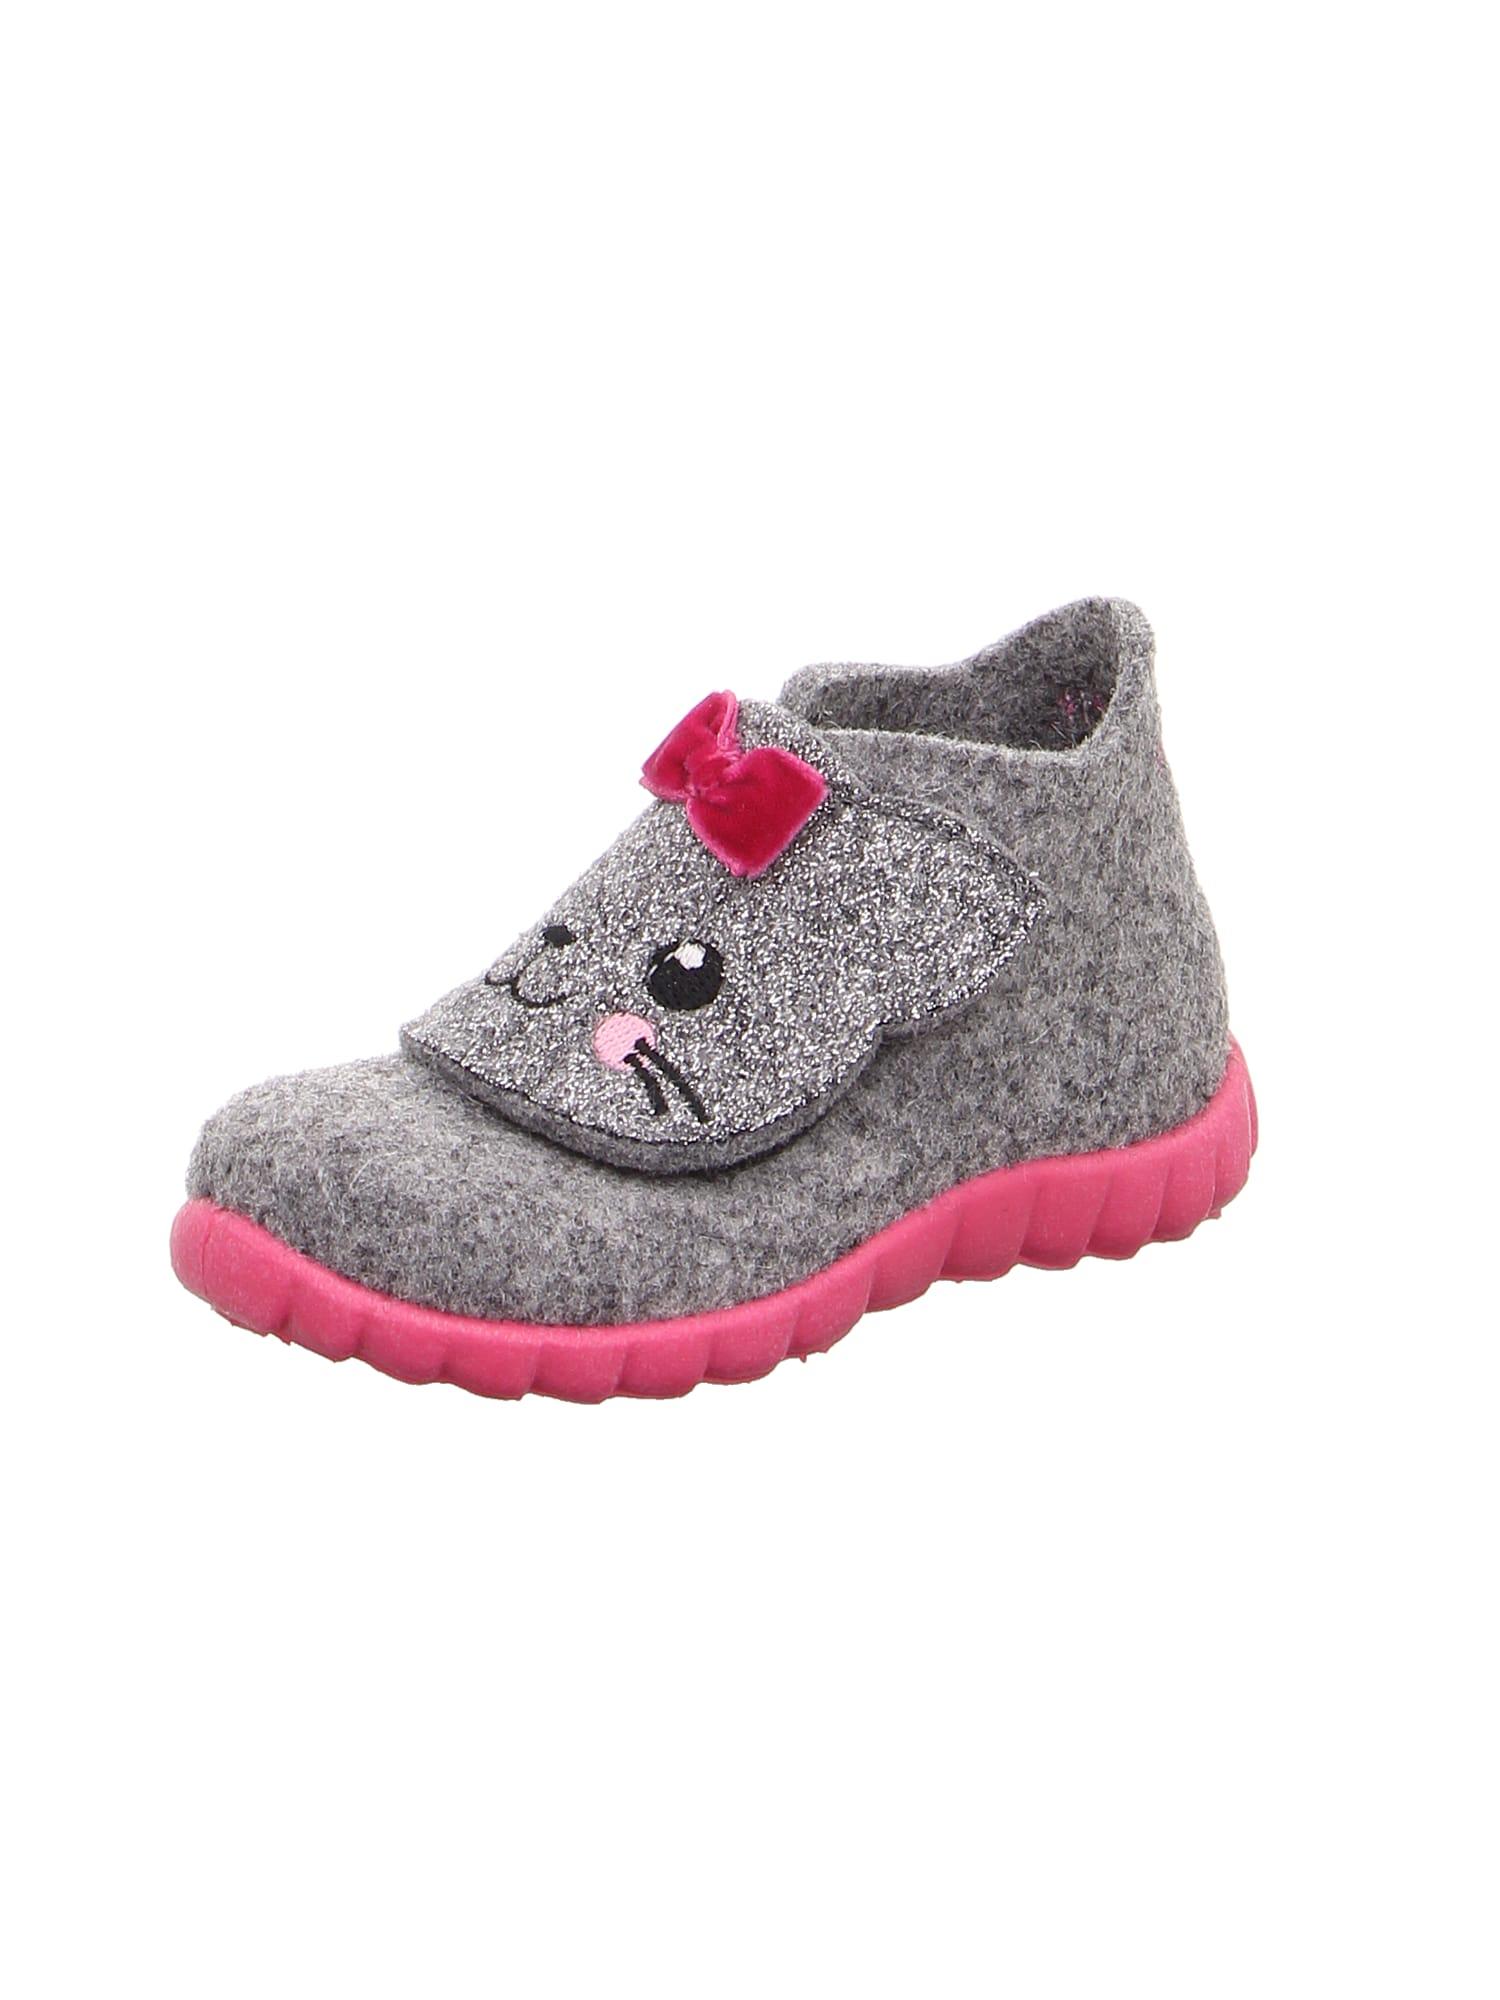 SUPERFIT Papuče 'Happy'  sivá / s ružovými fľakmi / čierna